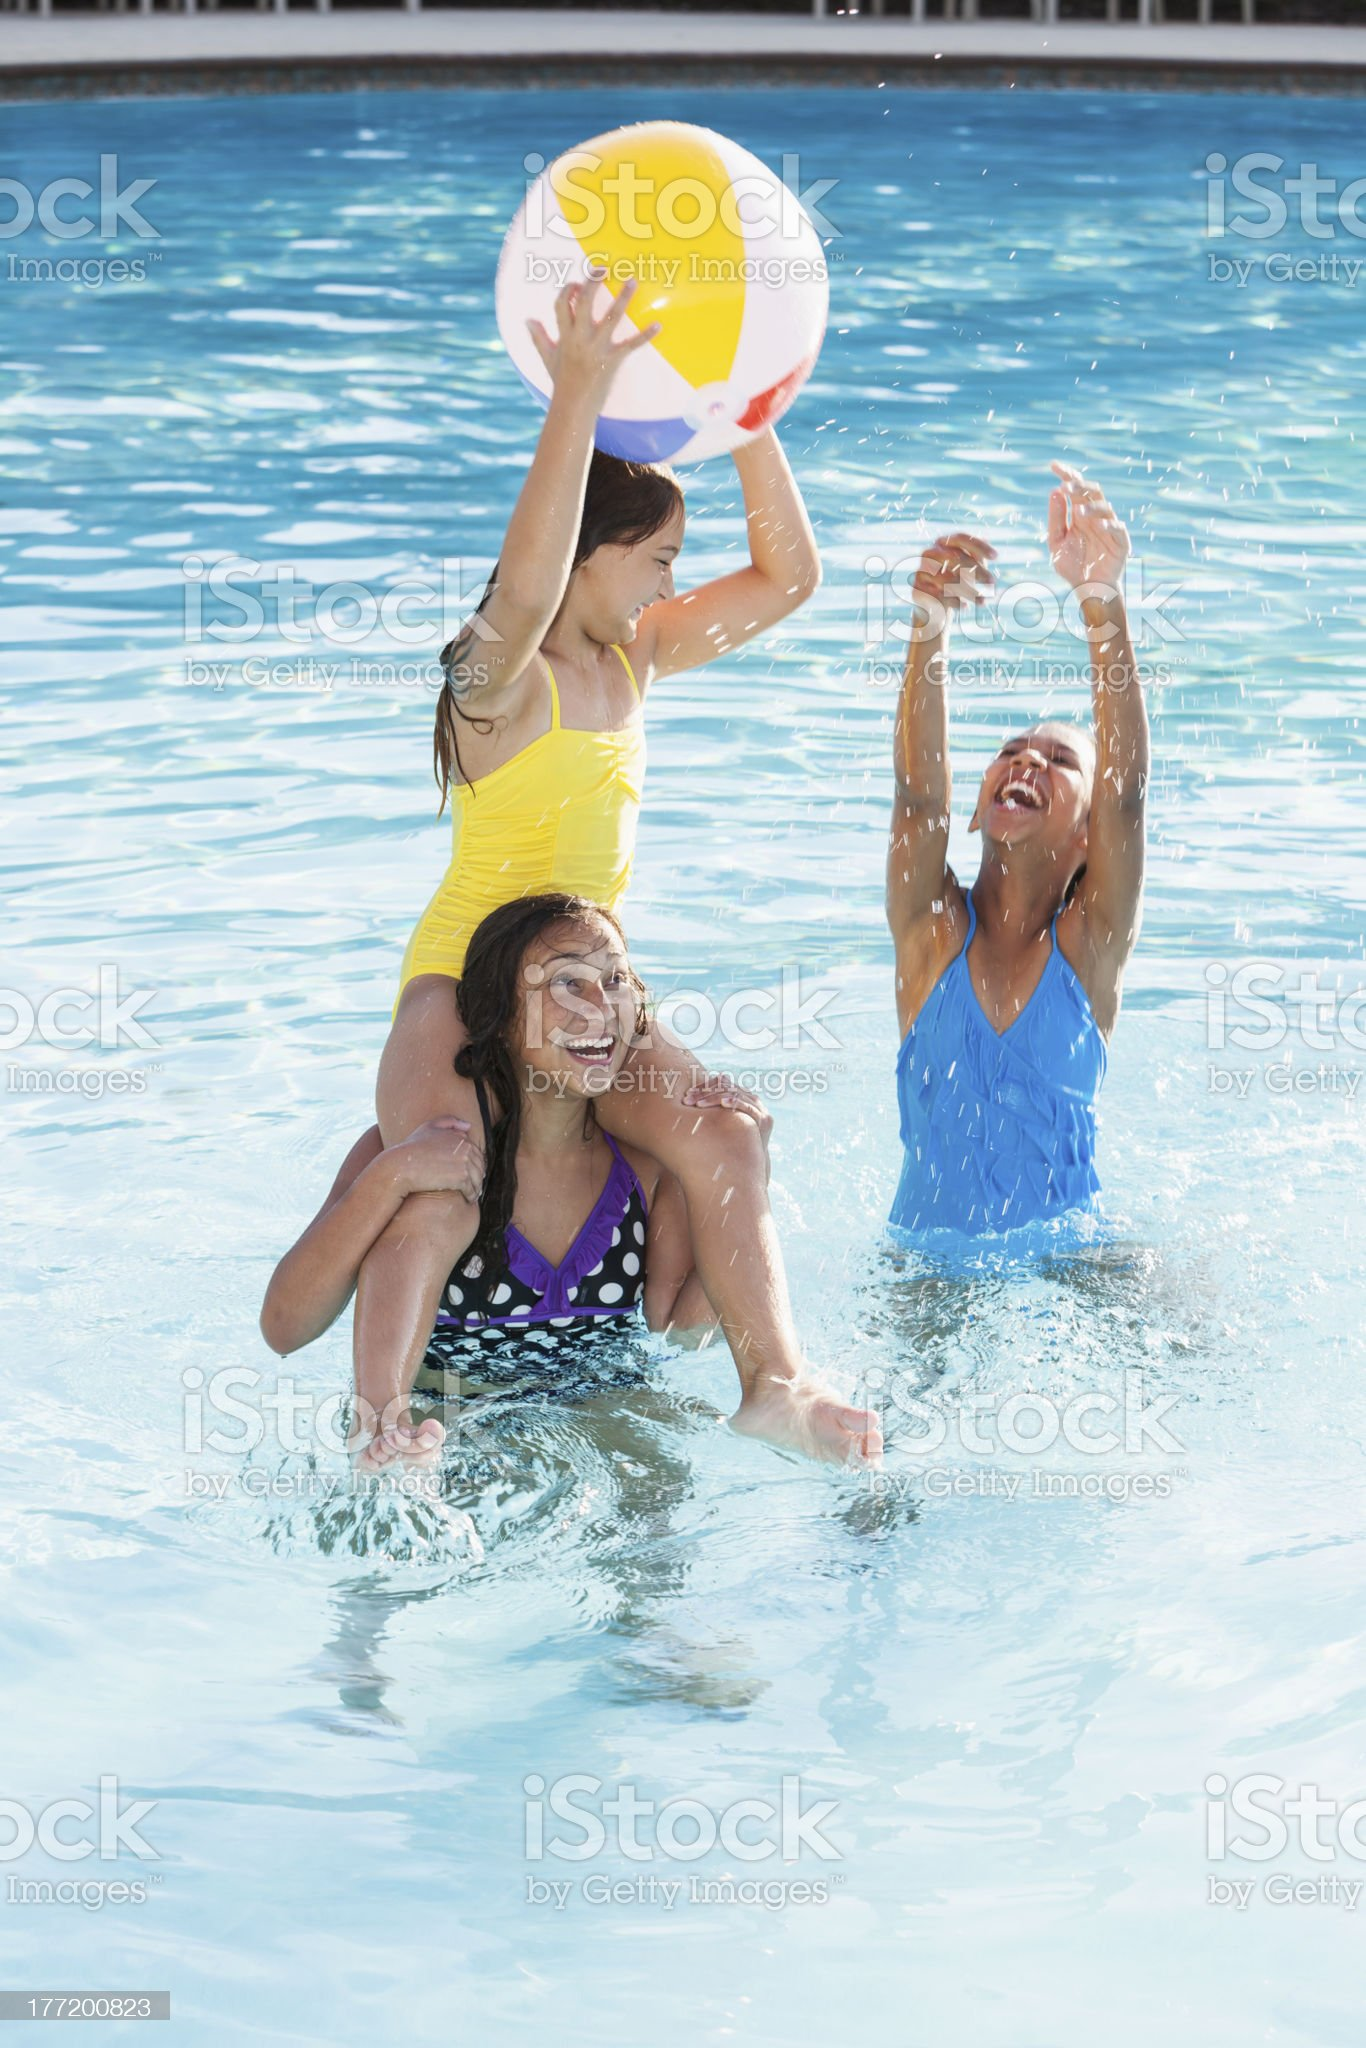 Girls playing in swimming pool. royalty-free stock photo